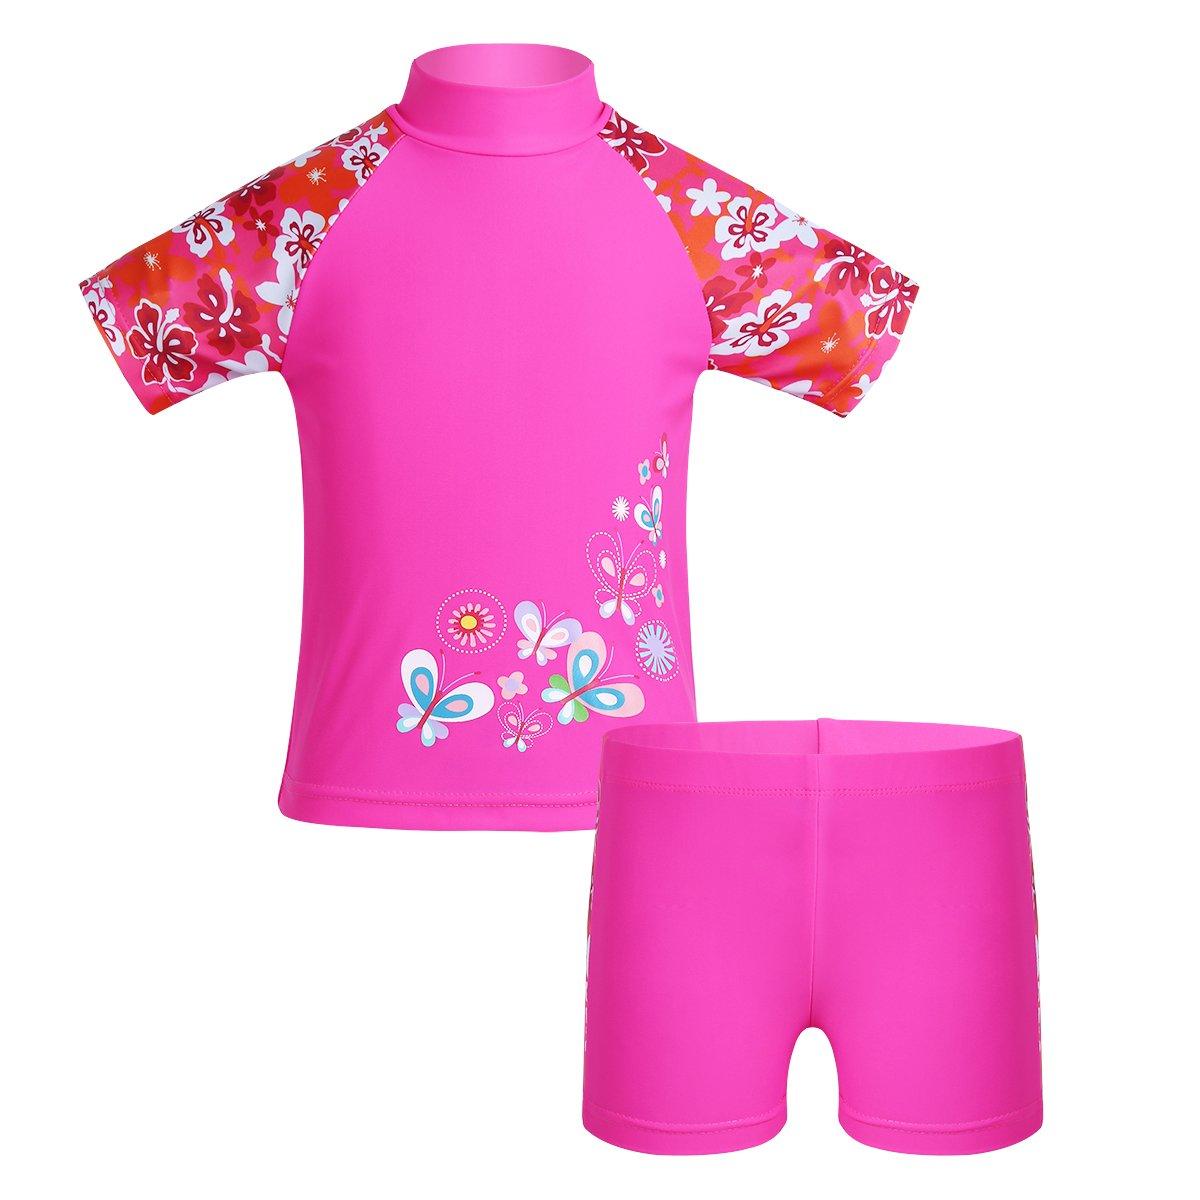 Freebily Kids Girls Two Piece Short Sleeve Rash Guard Tankini Swimsuit Swimwear Vest Sun Protection Wetsuit Set UPF 50+